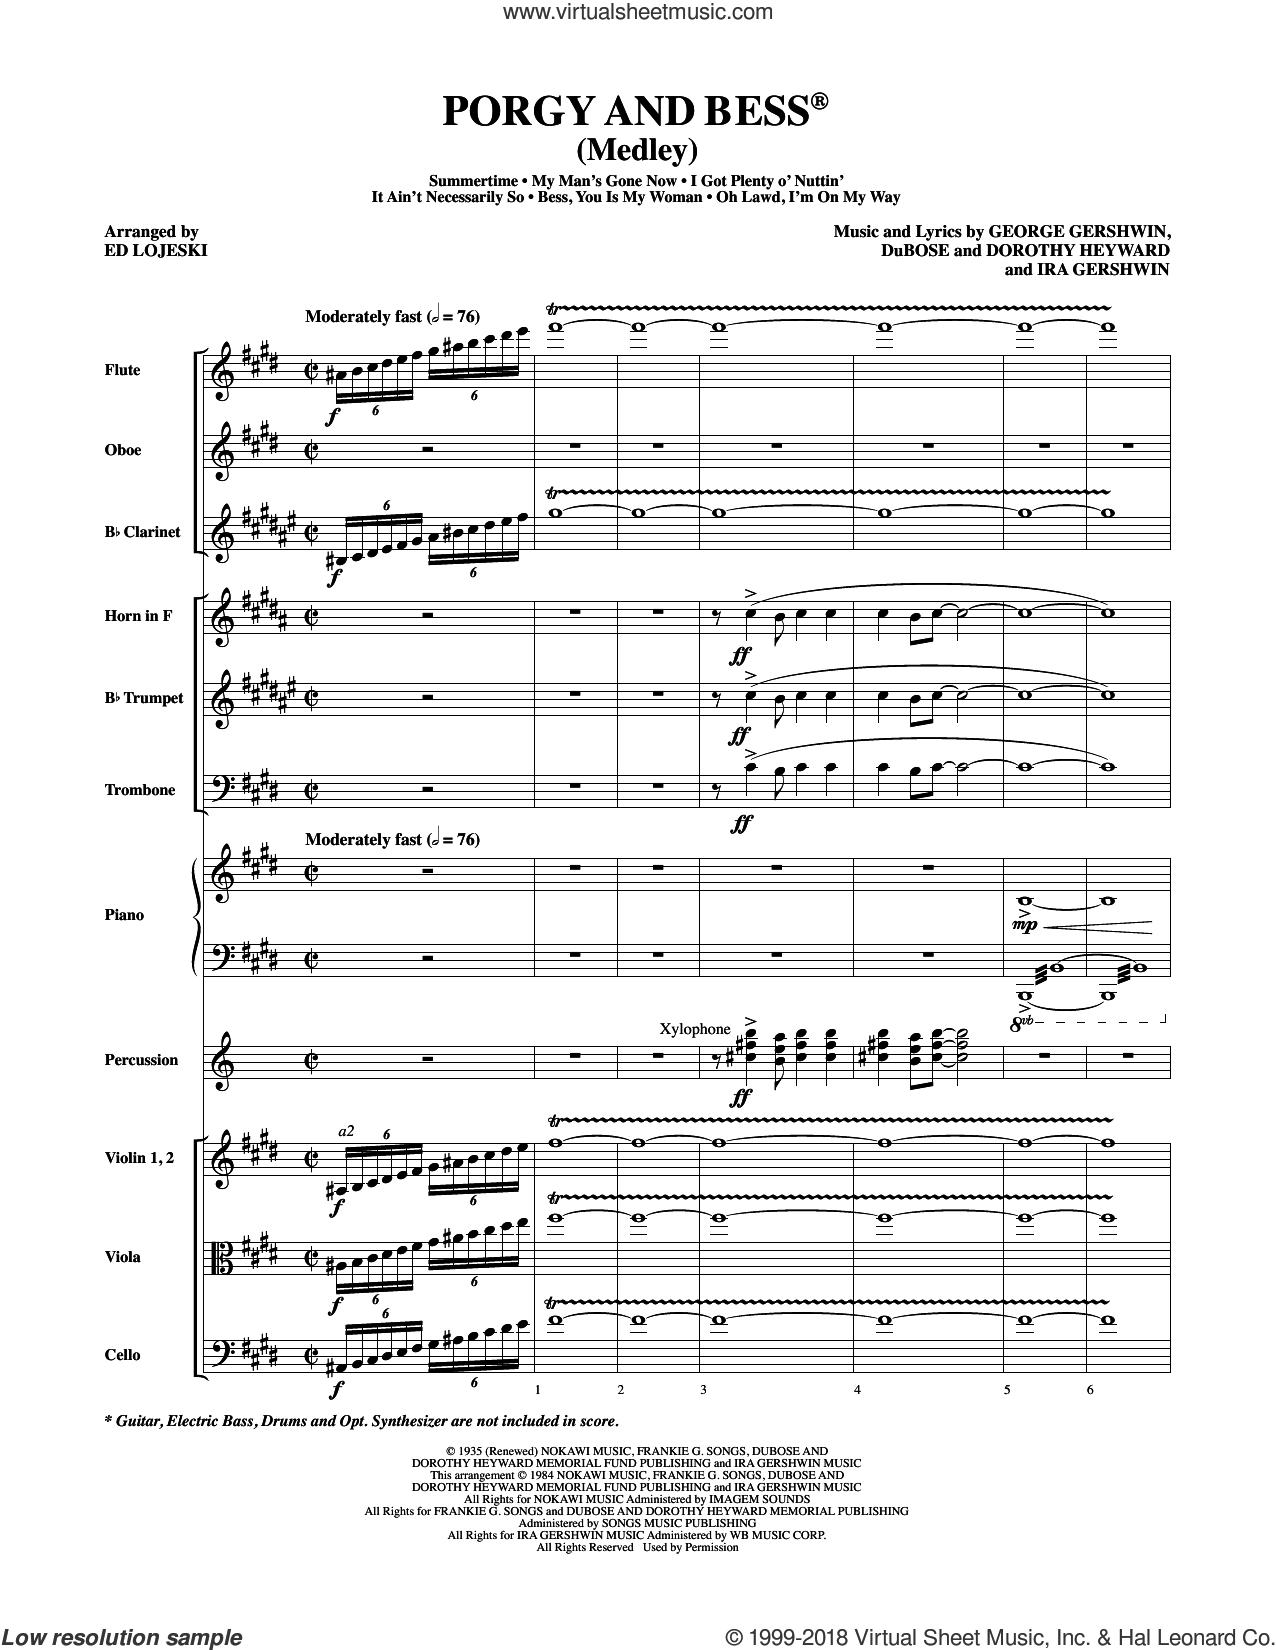 Porgy and Bess (COMPLETE) sheet music for orchestra/band by George Gershwin, Dorothy Heyward, DuBose Heyward, Ed Lojeski and Ira Gershwin, intermediate skill level